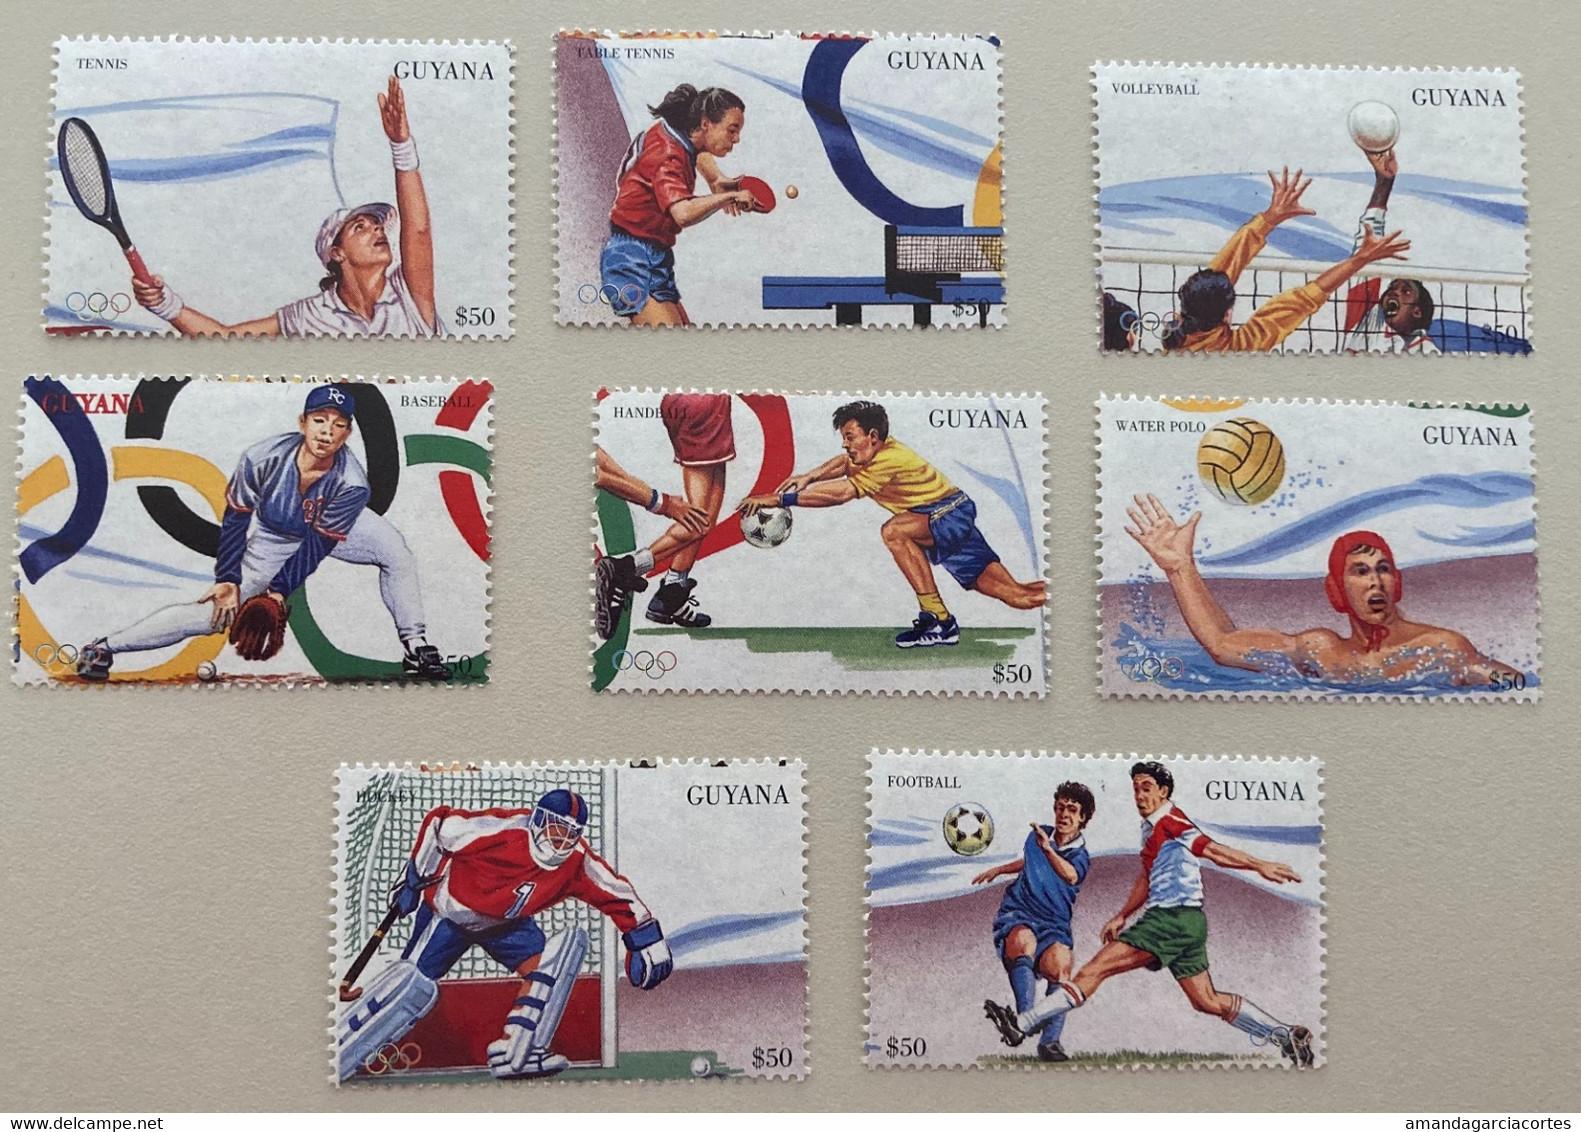 Guyana 1996 Olympic Games Handball Voleyball Football Hockey Tennis Baseball Waterpolo - Guyana (1966-...)